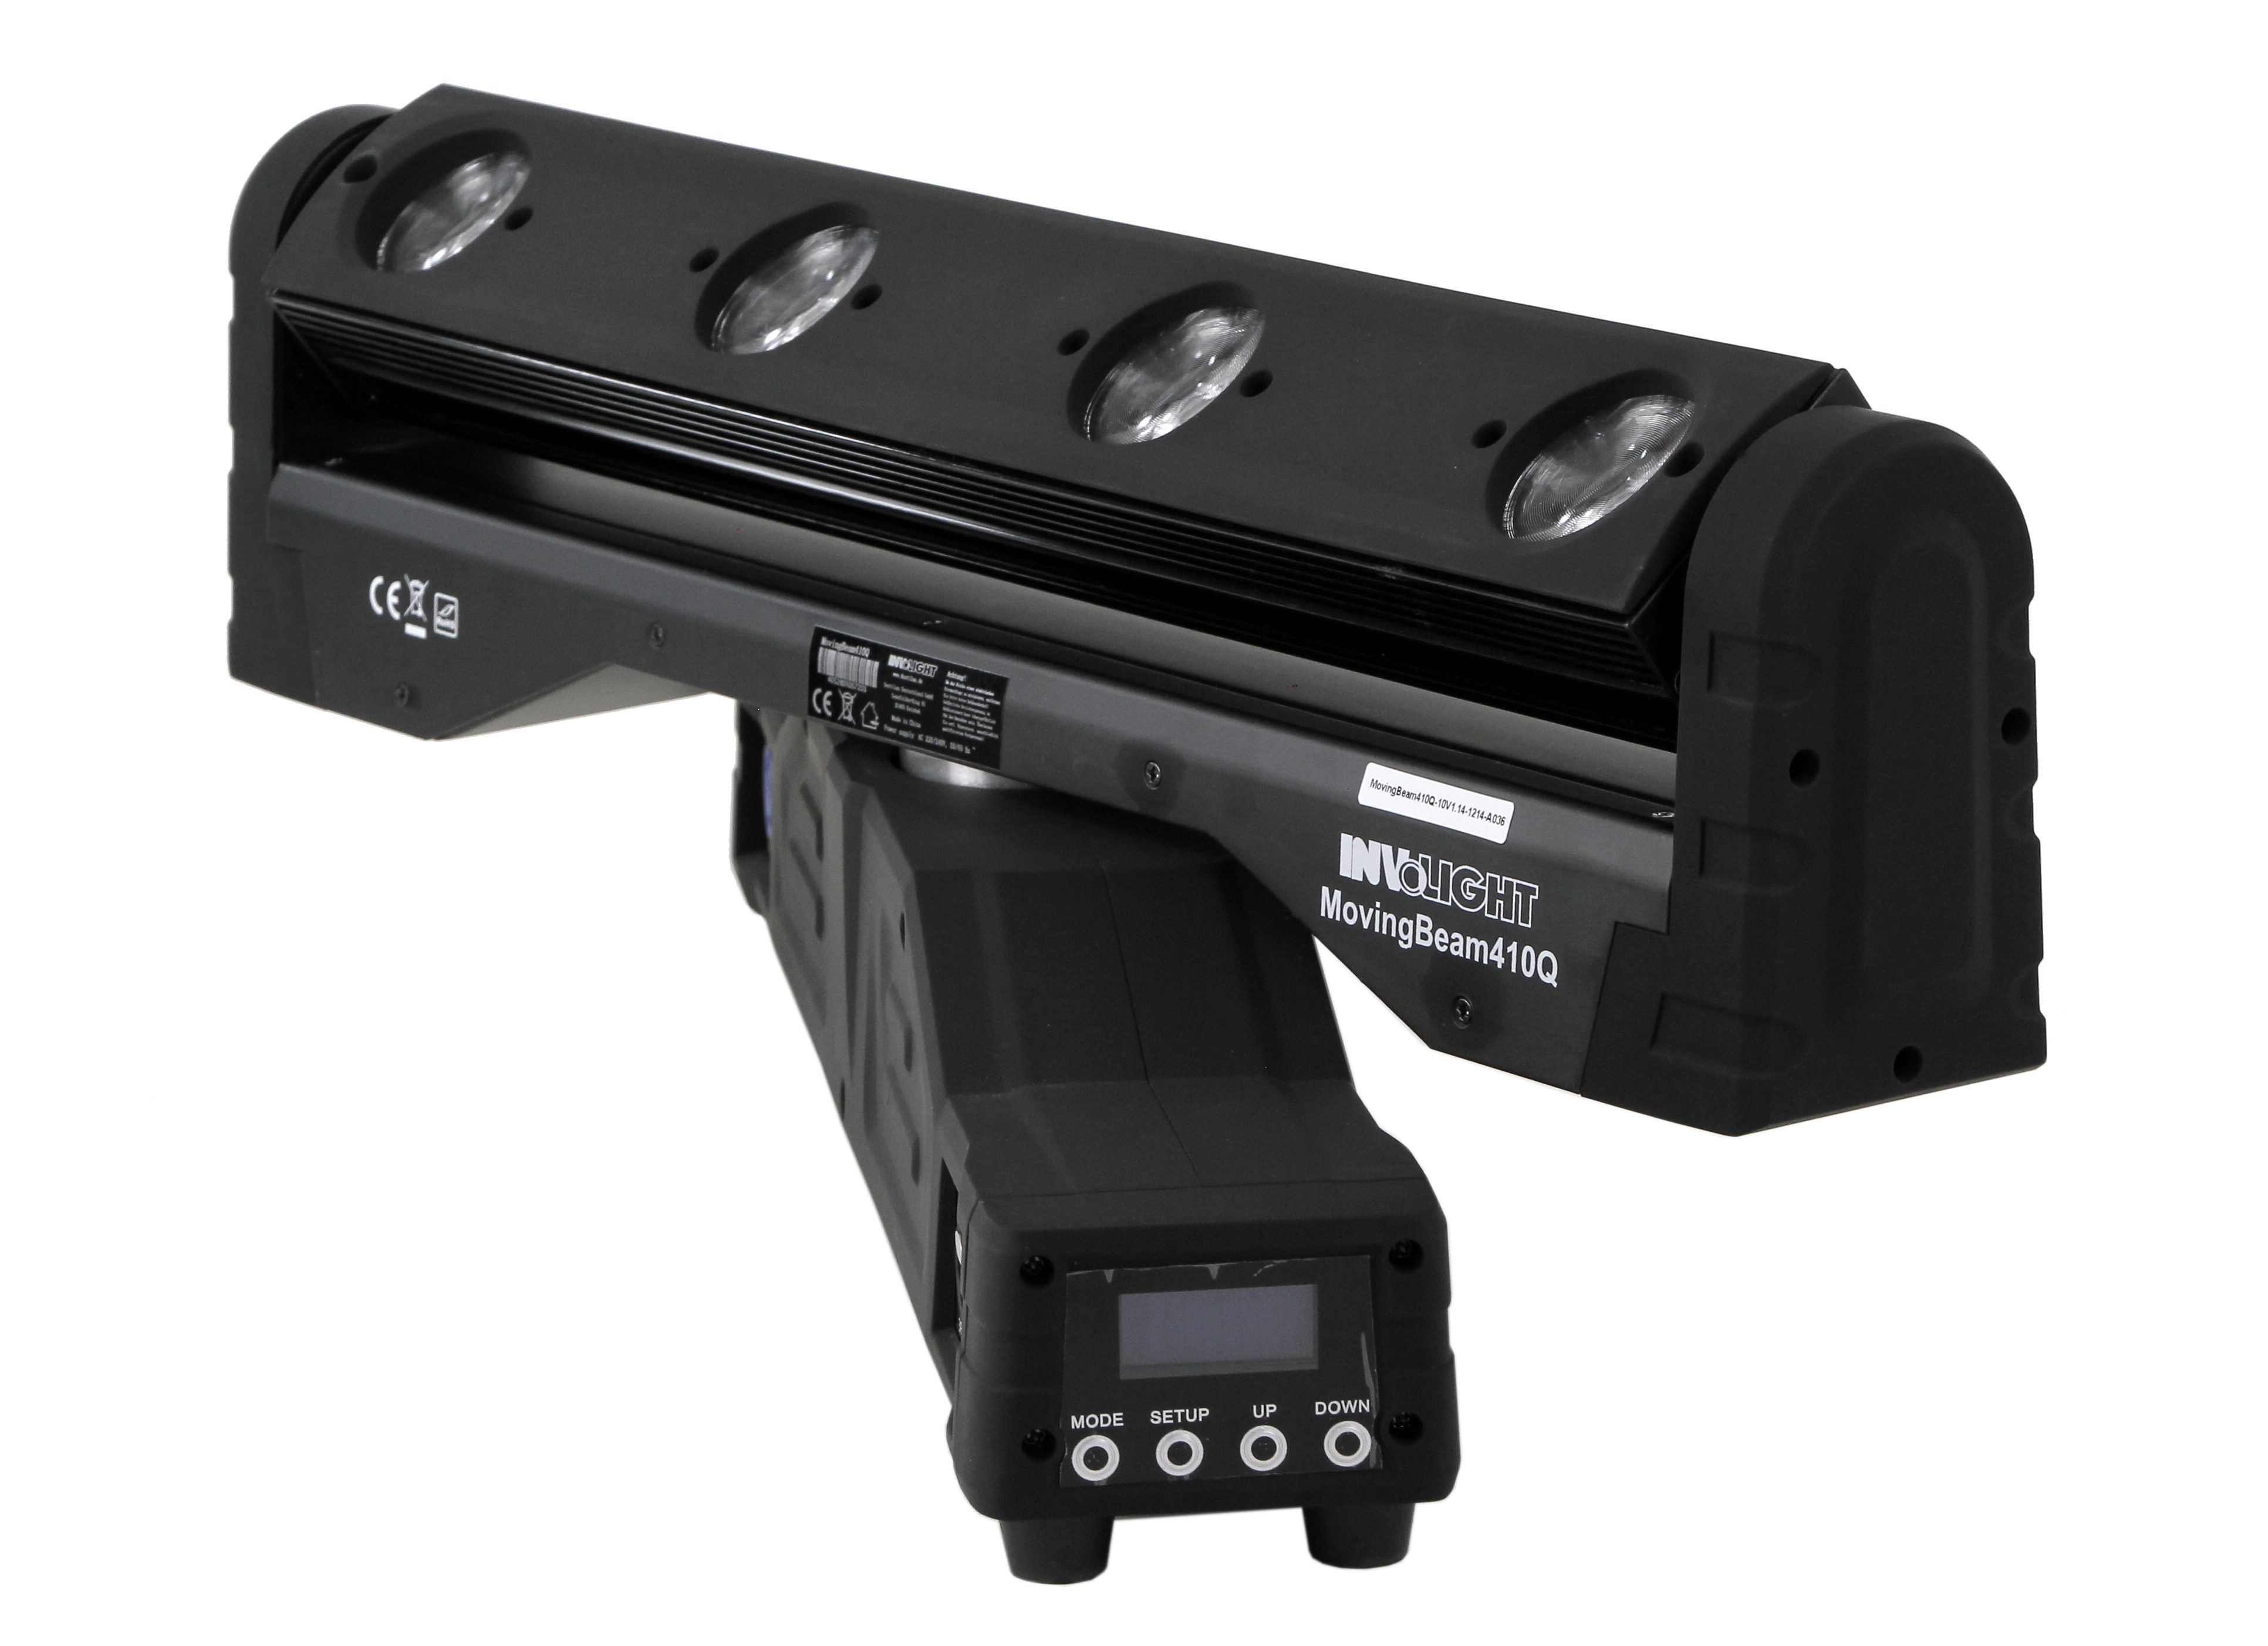 Involight Motorisiertes Beam-Lichteffektgerät »MovingBeam410Q«